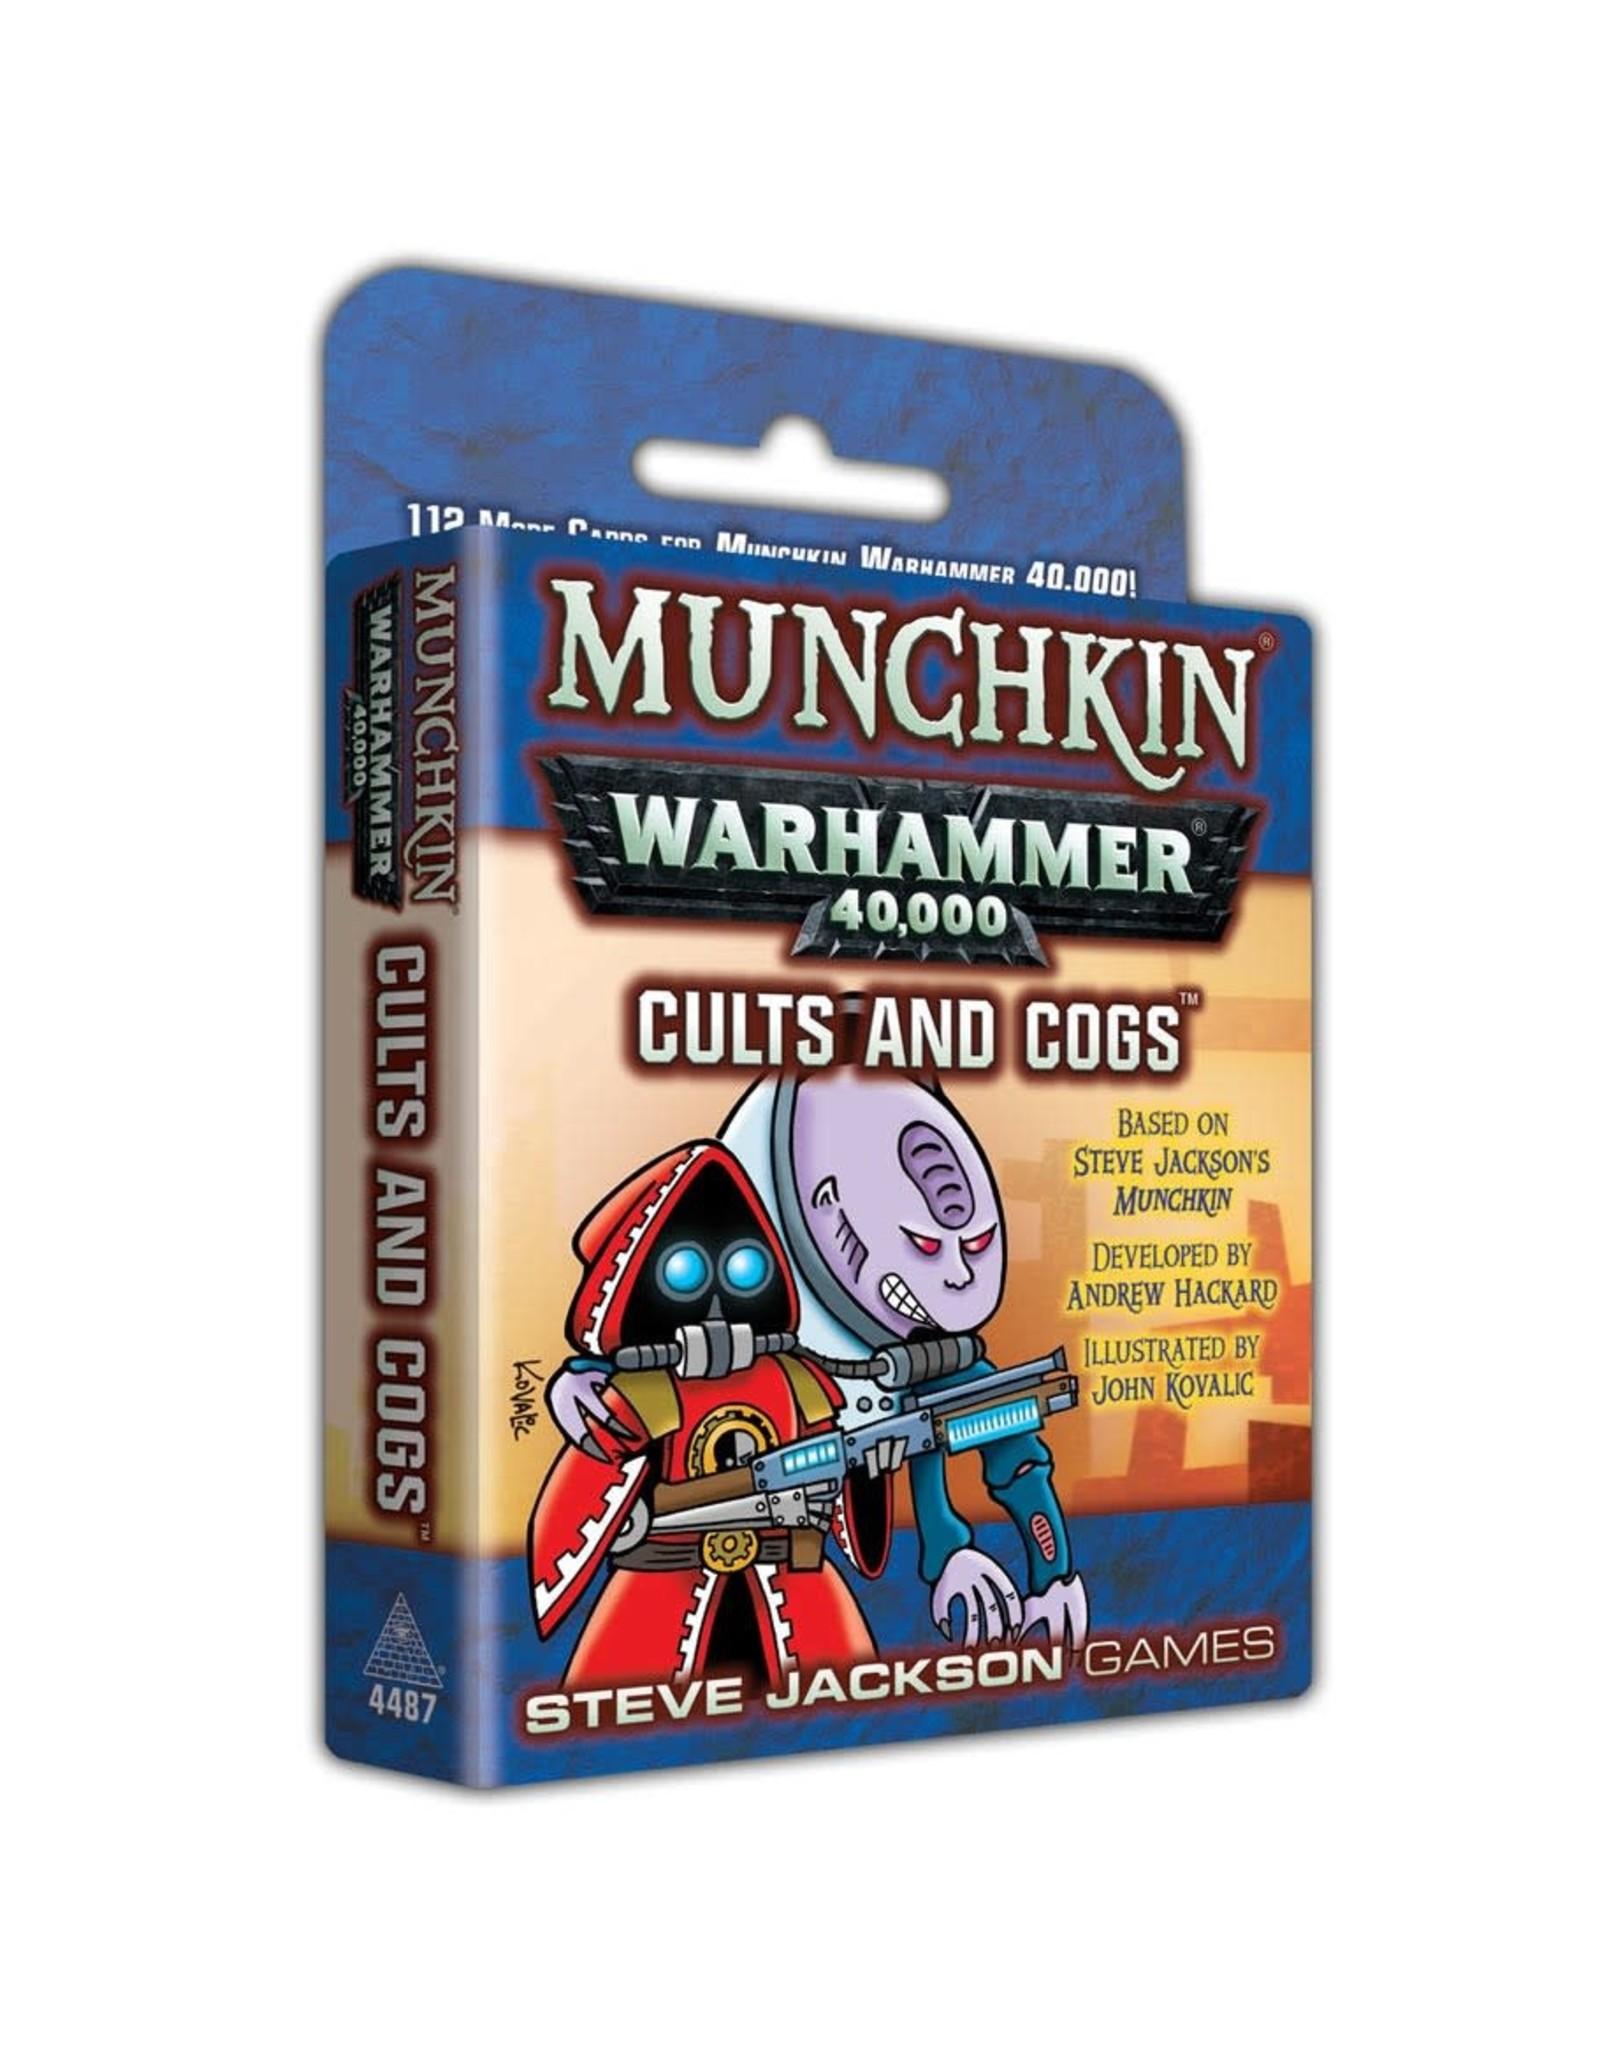 Steve Jackson Games Munchkin: Warhammer 40k Cults and Cogs